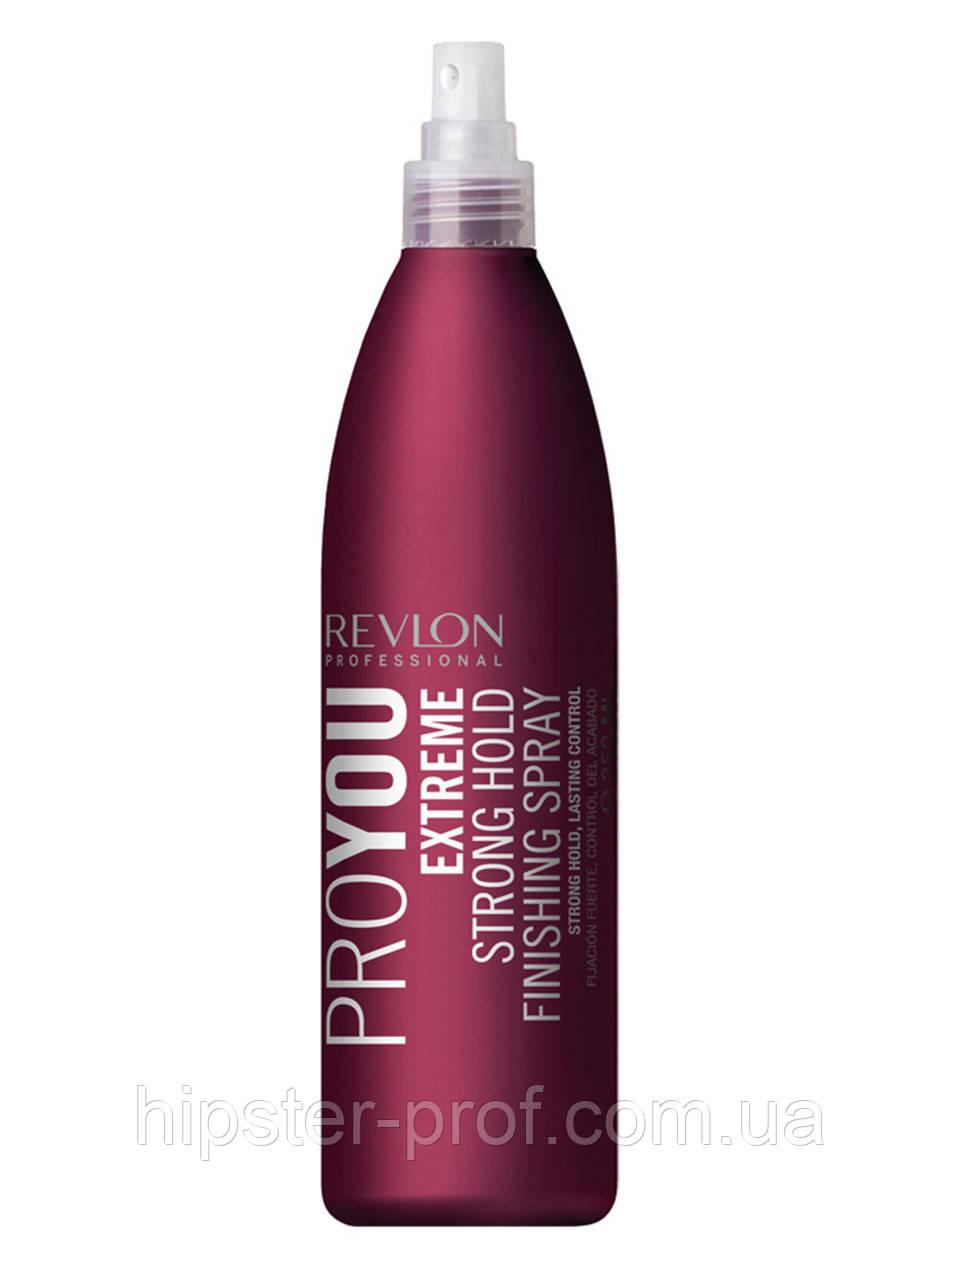 Лак сильной фиксации без аэрозоля Revlon Professional Pro You Extreme Strong Hold Finishing Spray 350 ml